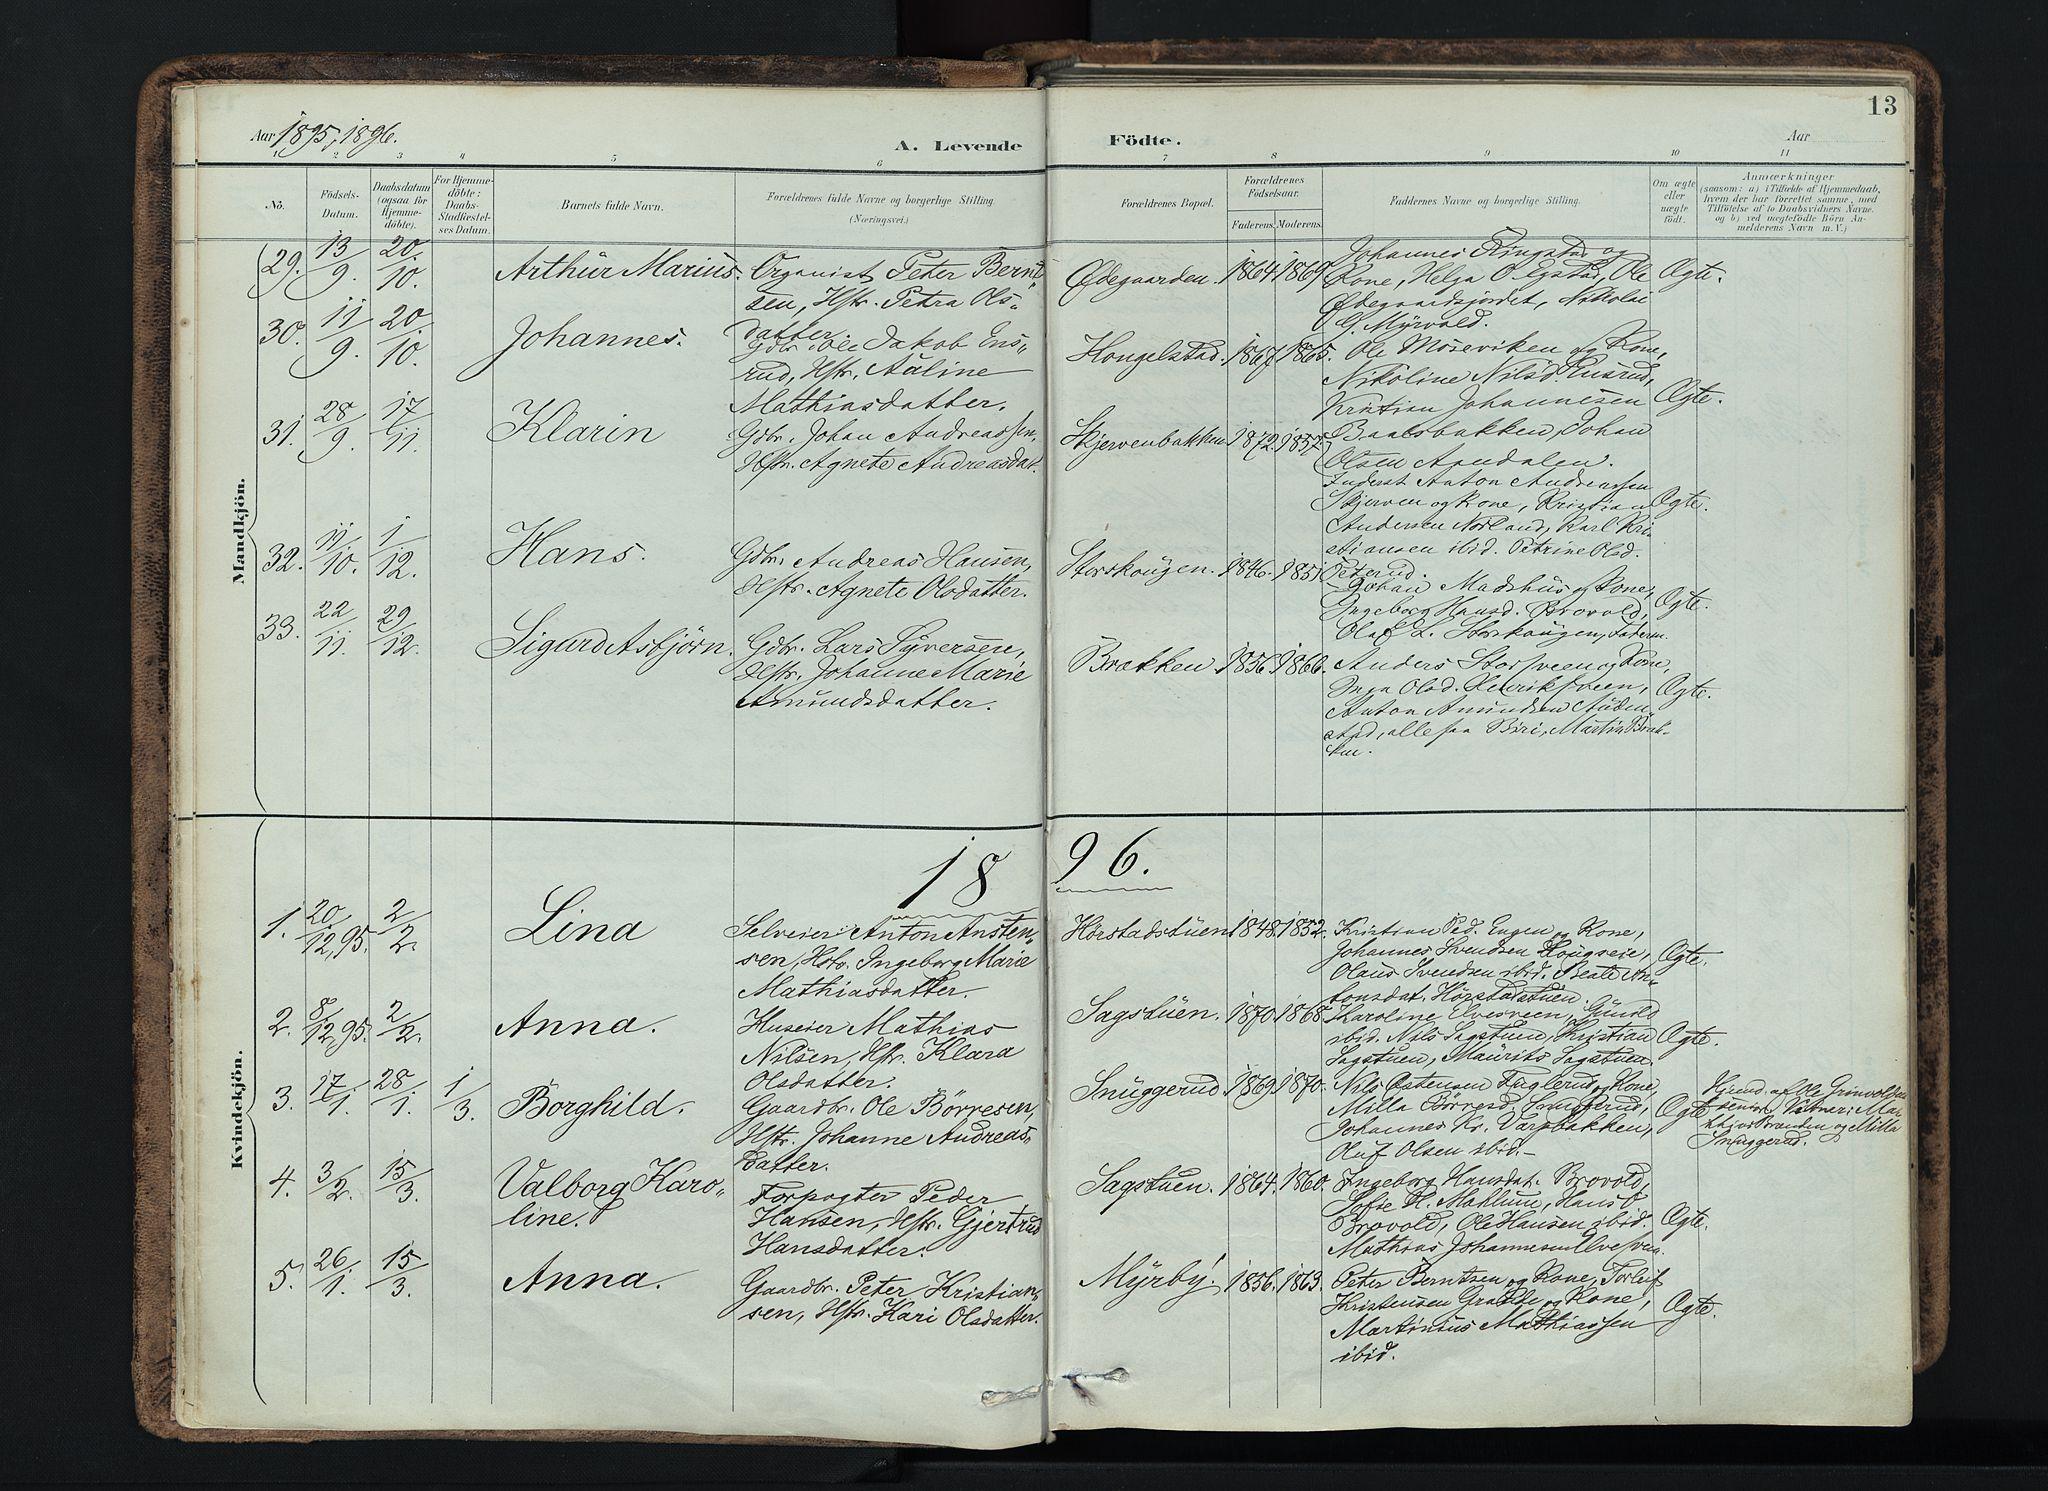 SAH, Vardal prestekontor, H/Ha/Haa/L0019: Ministerialbok nr. 19, 1893-1907, s. 13